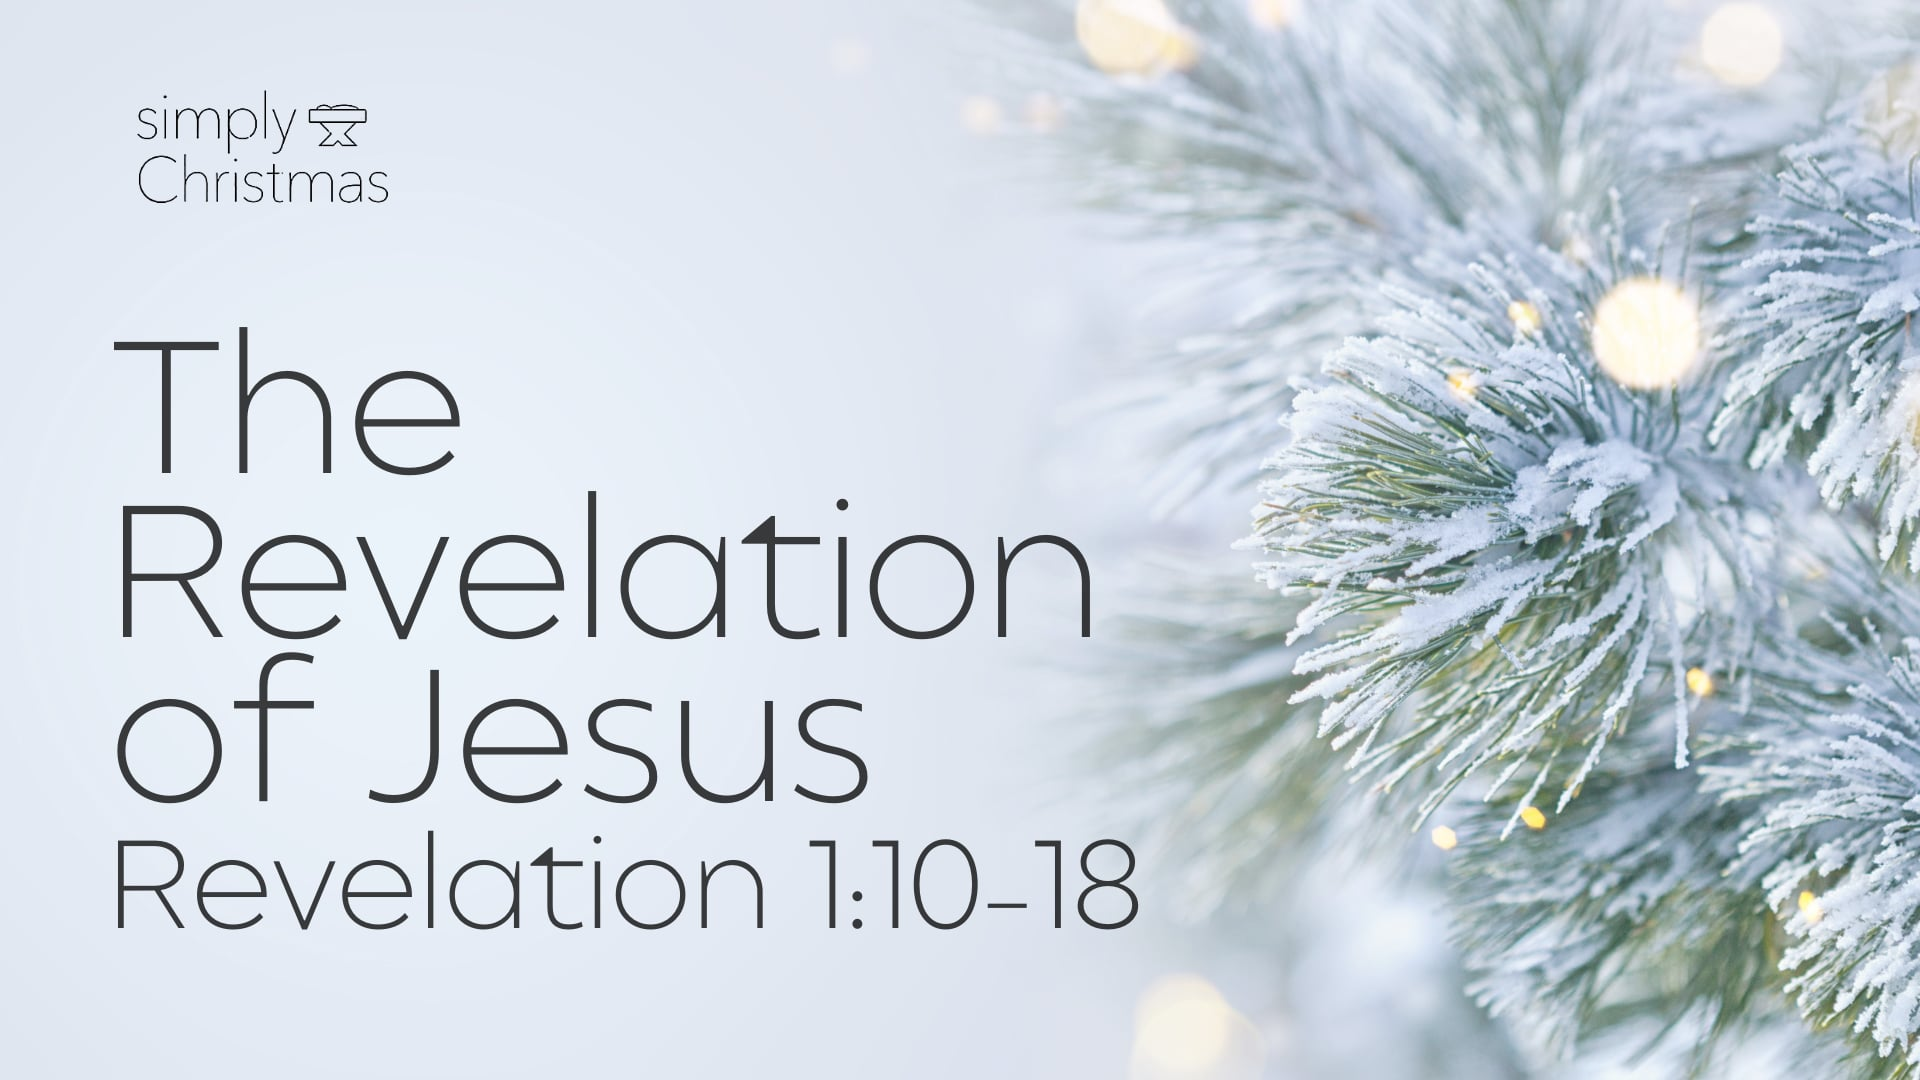 The Revelation of Jesus - December 6, 2020